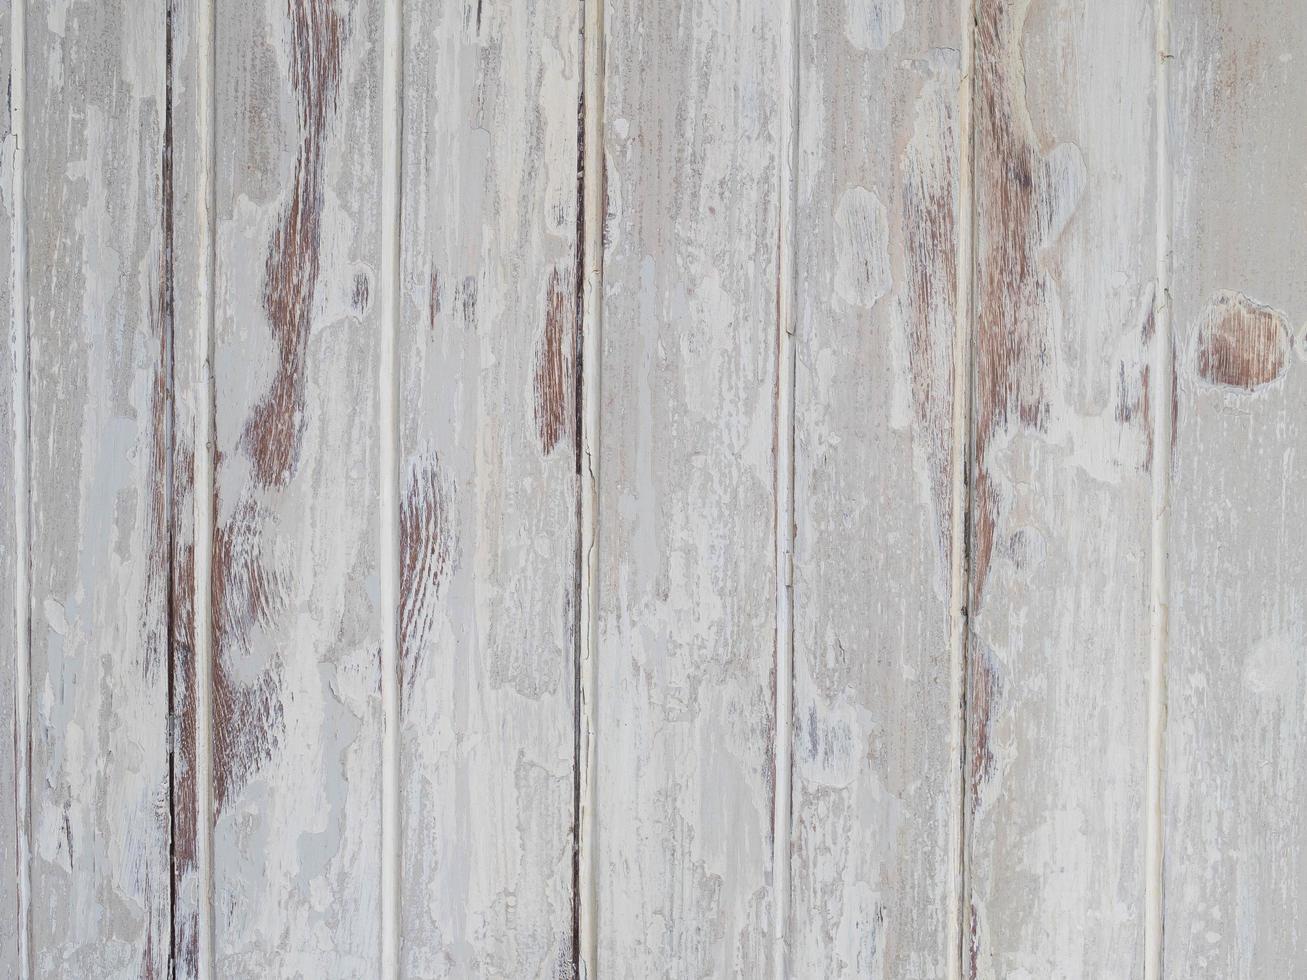 wit shabby chic houten foto